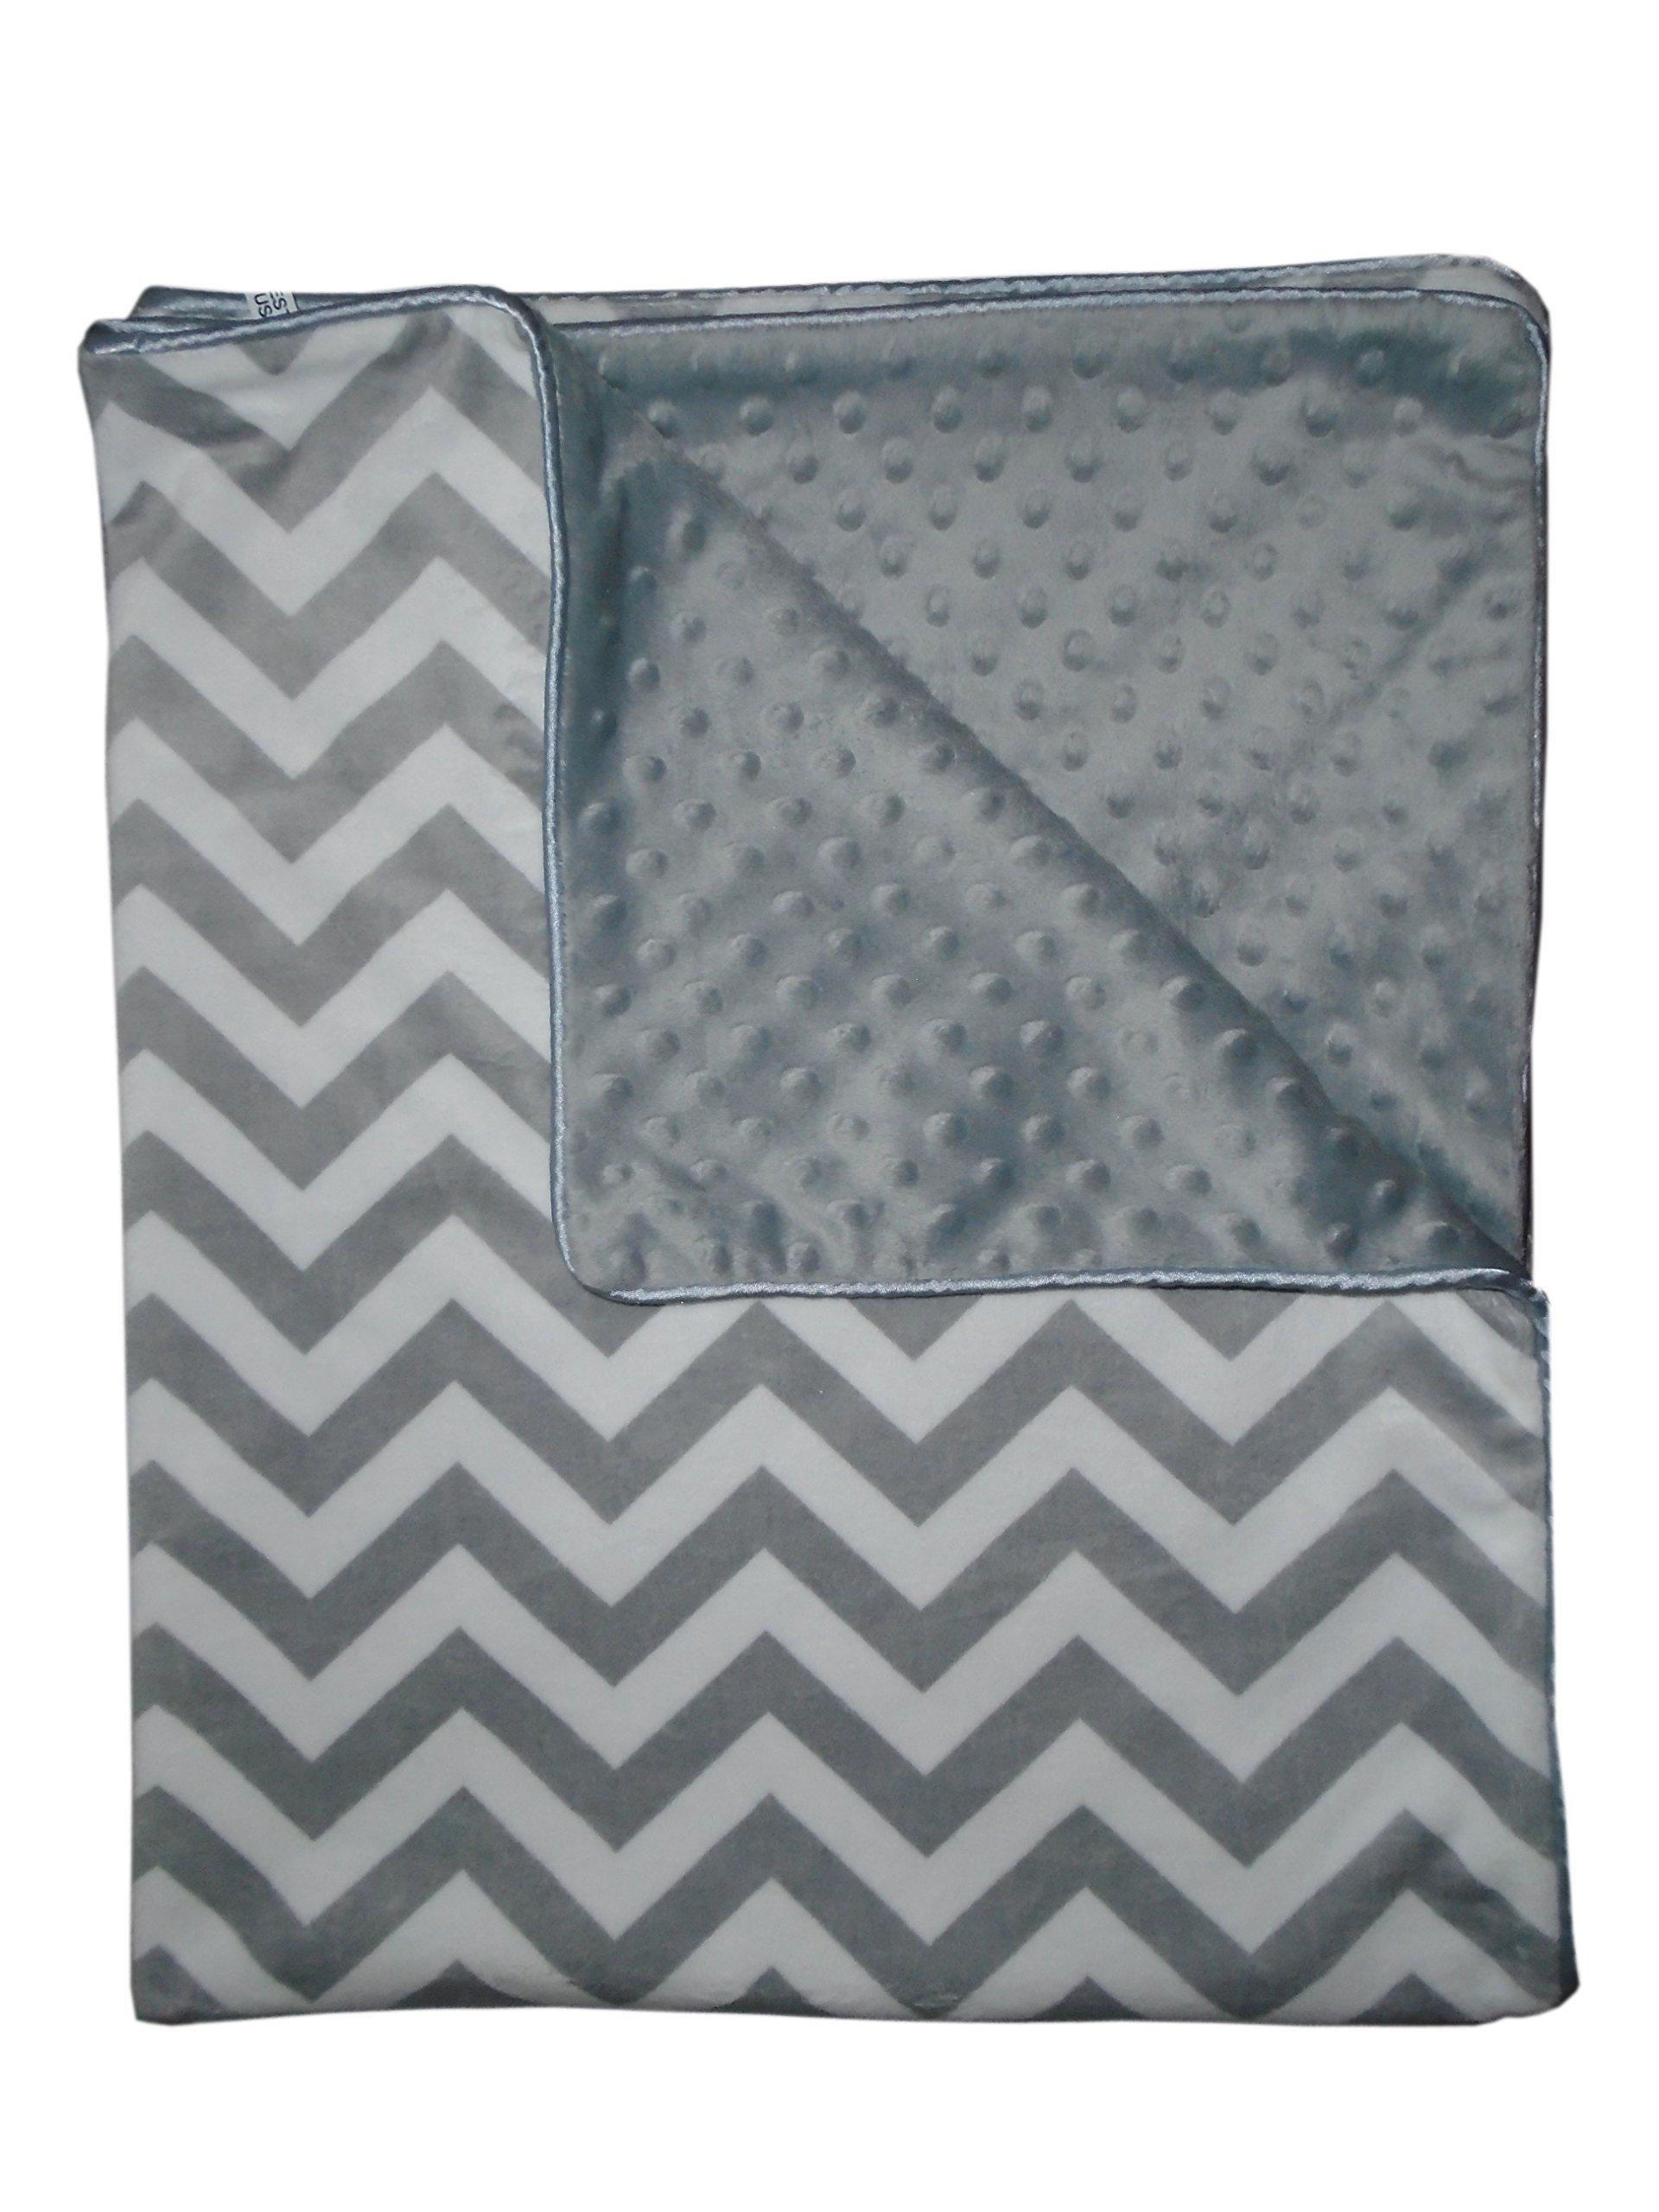 Baby Doll Minky Chevron Crib Comforter, Grey